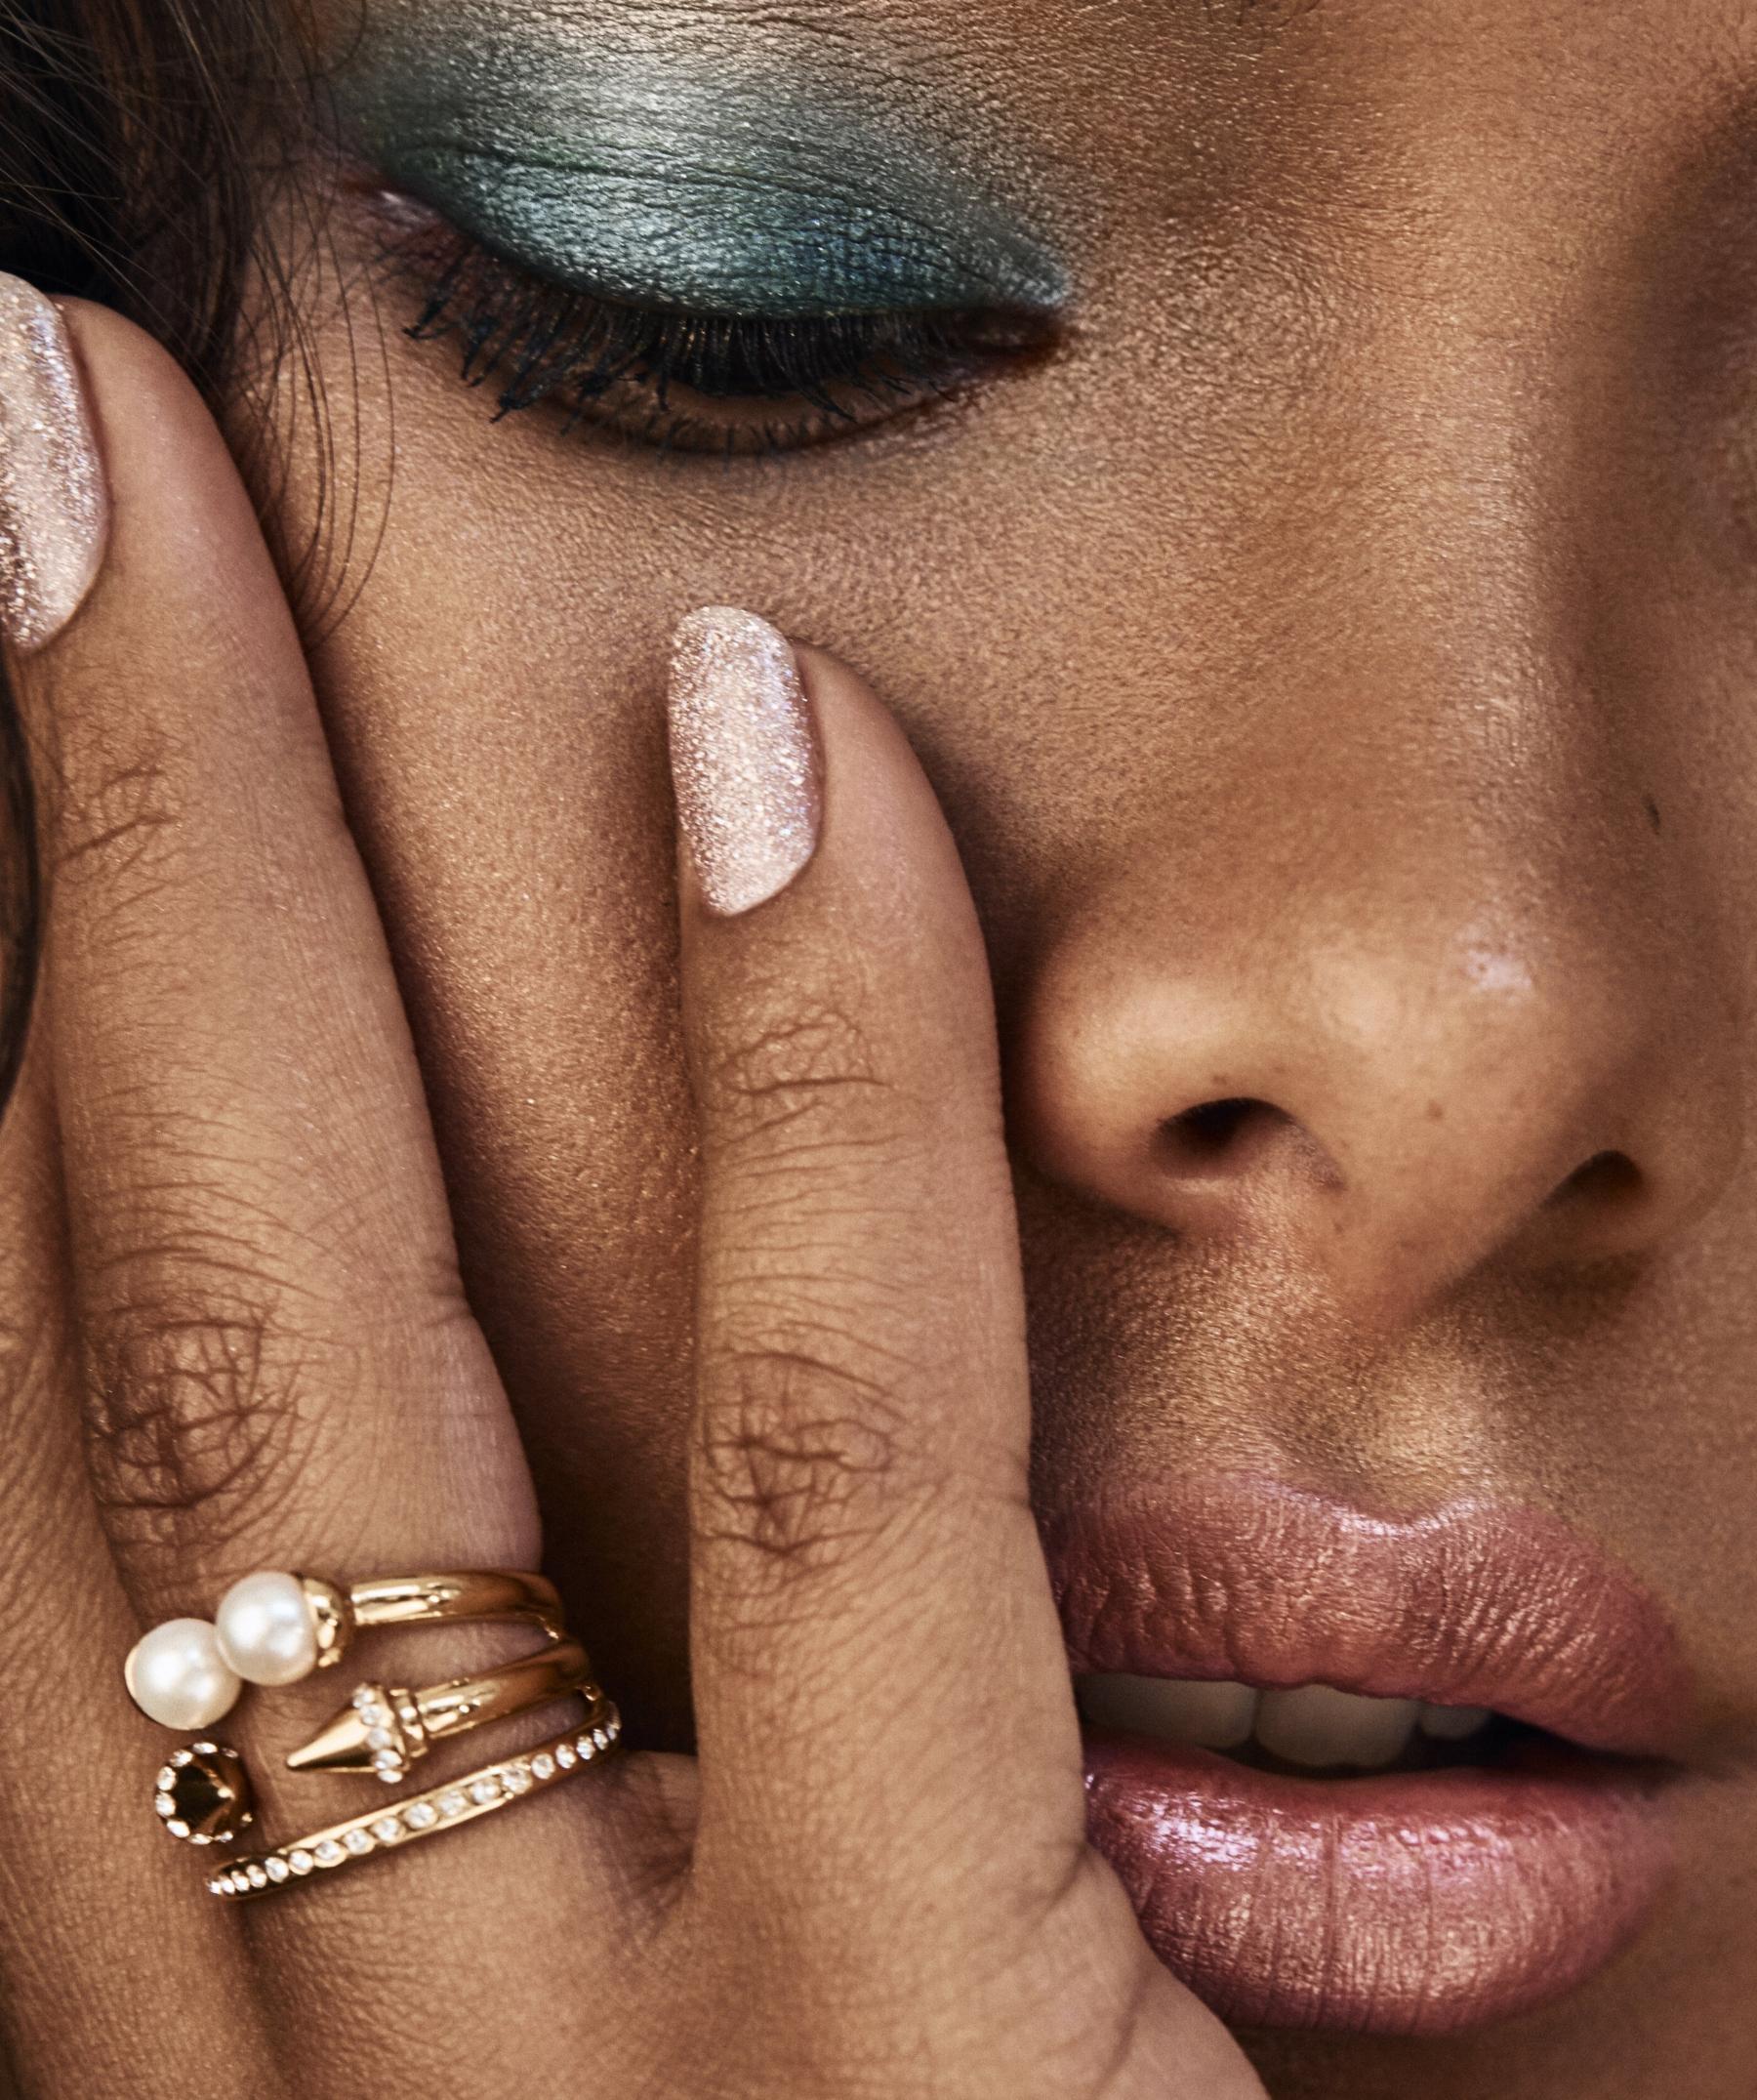 tori_h_beauty-Lais-glitter-nails-1.jpg